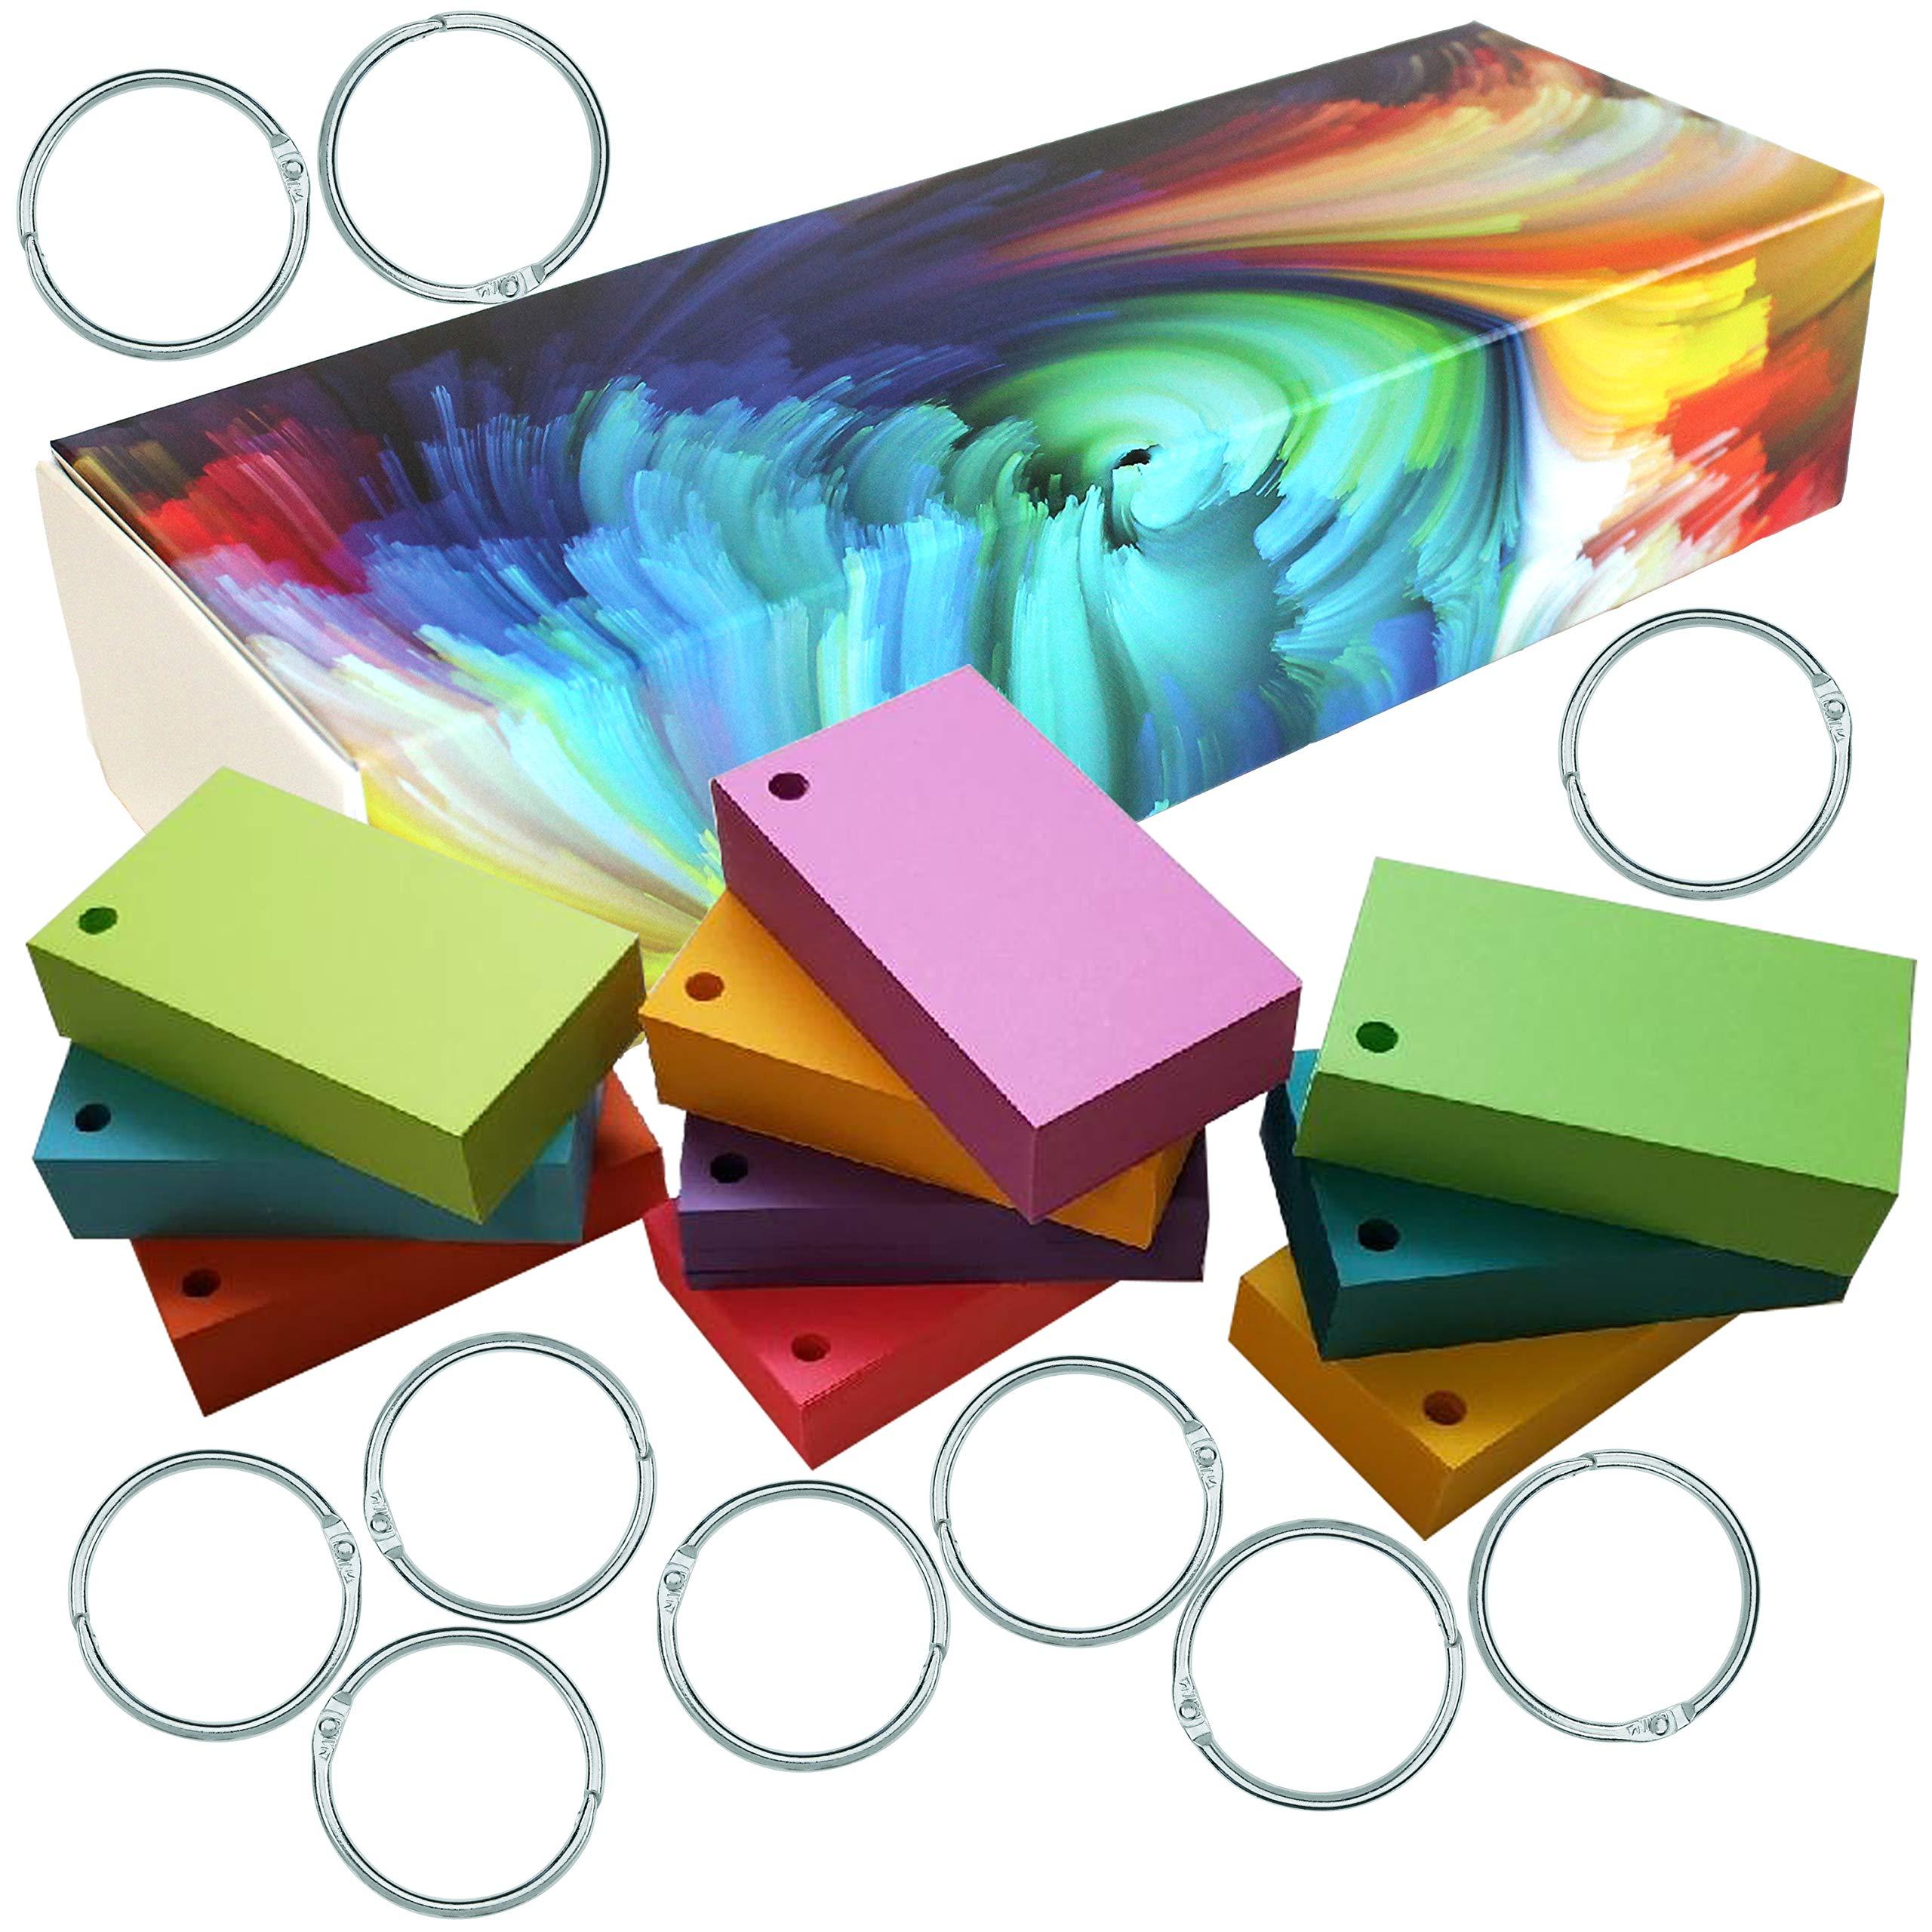 DEBRADALE DESIGNS - 900 Blank Hole Punched Flash Note Cards - 10 Bright Colors - 10 Metal Binder Rings - Standard 65# Cover Card Stock - 176 GSM by DEBRADALE DESIGNS